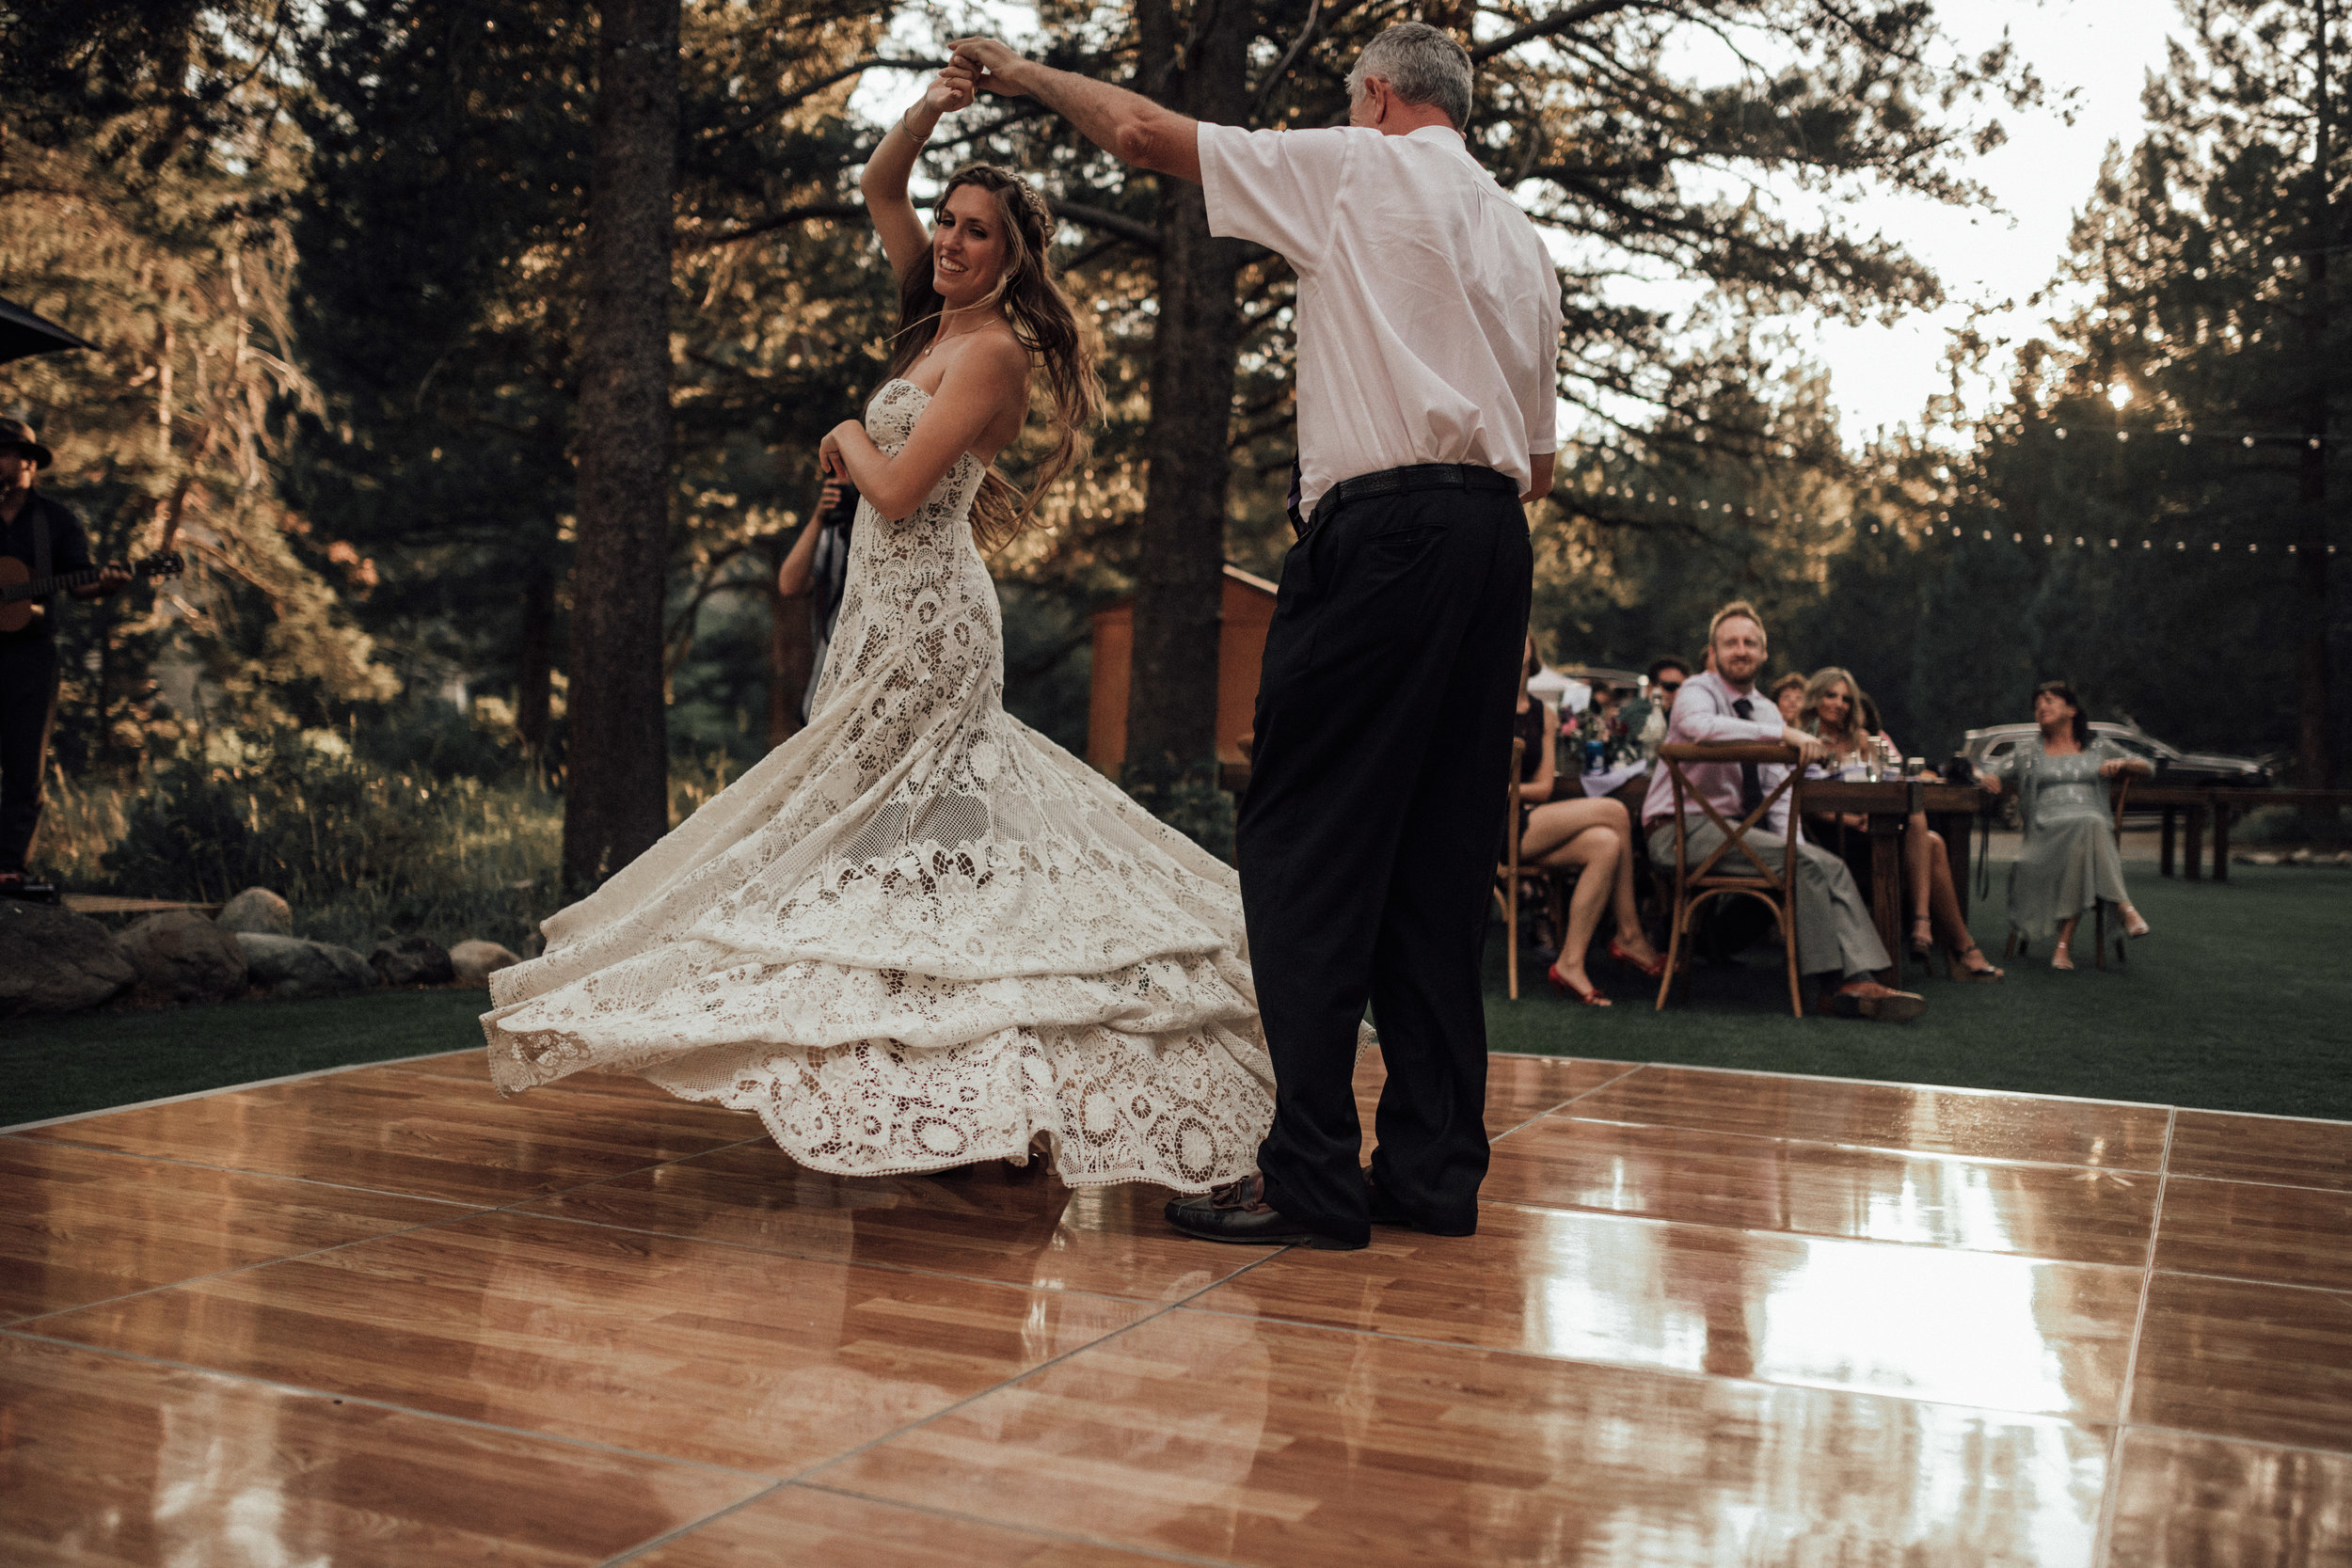 may-wedding-dancing-pines-sierraville-wedding-ca-danielle-kyle-junebug-photography-lake-tahoe-1-2145.jpg